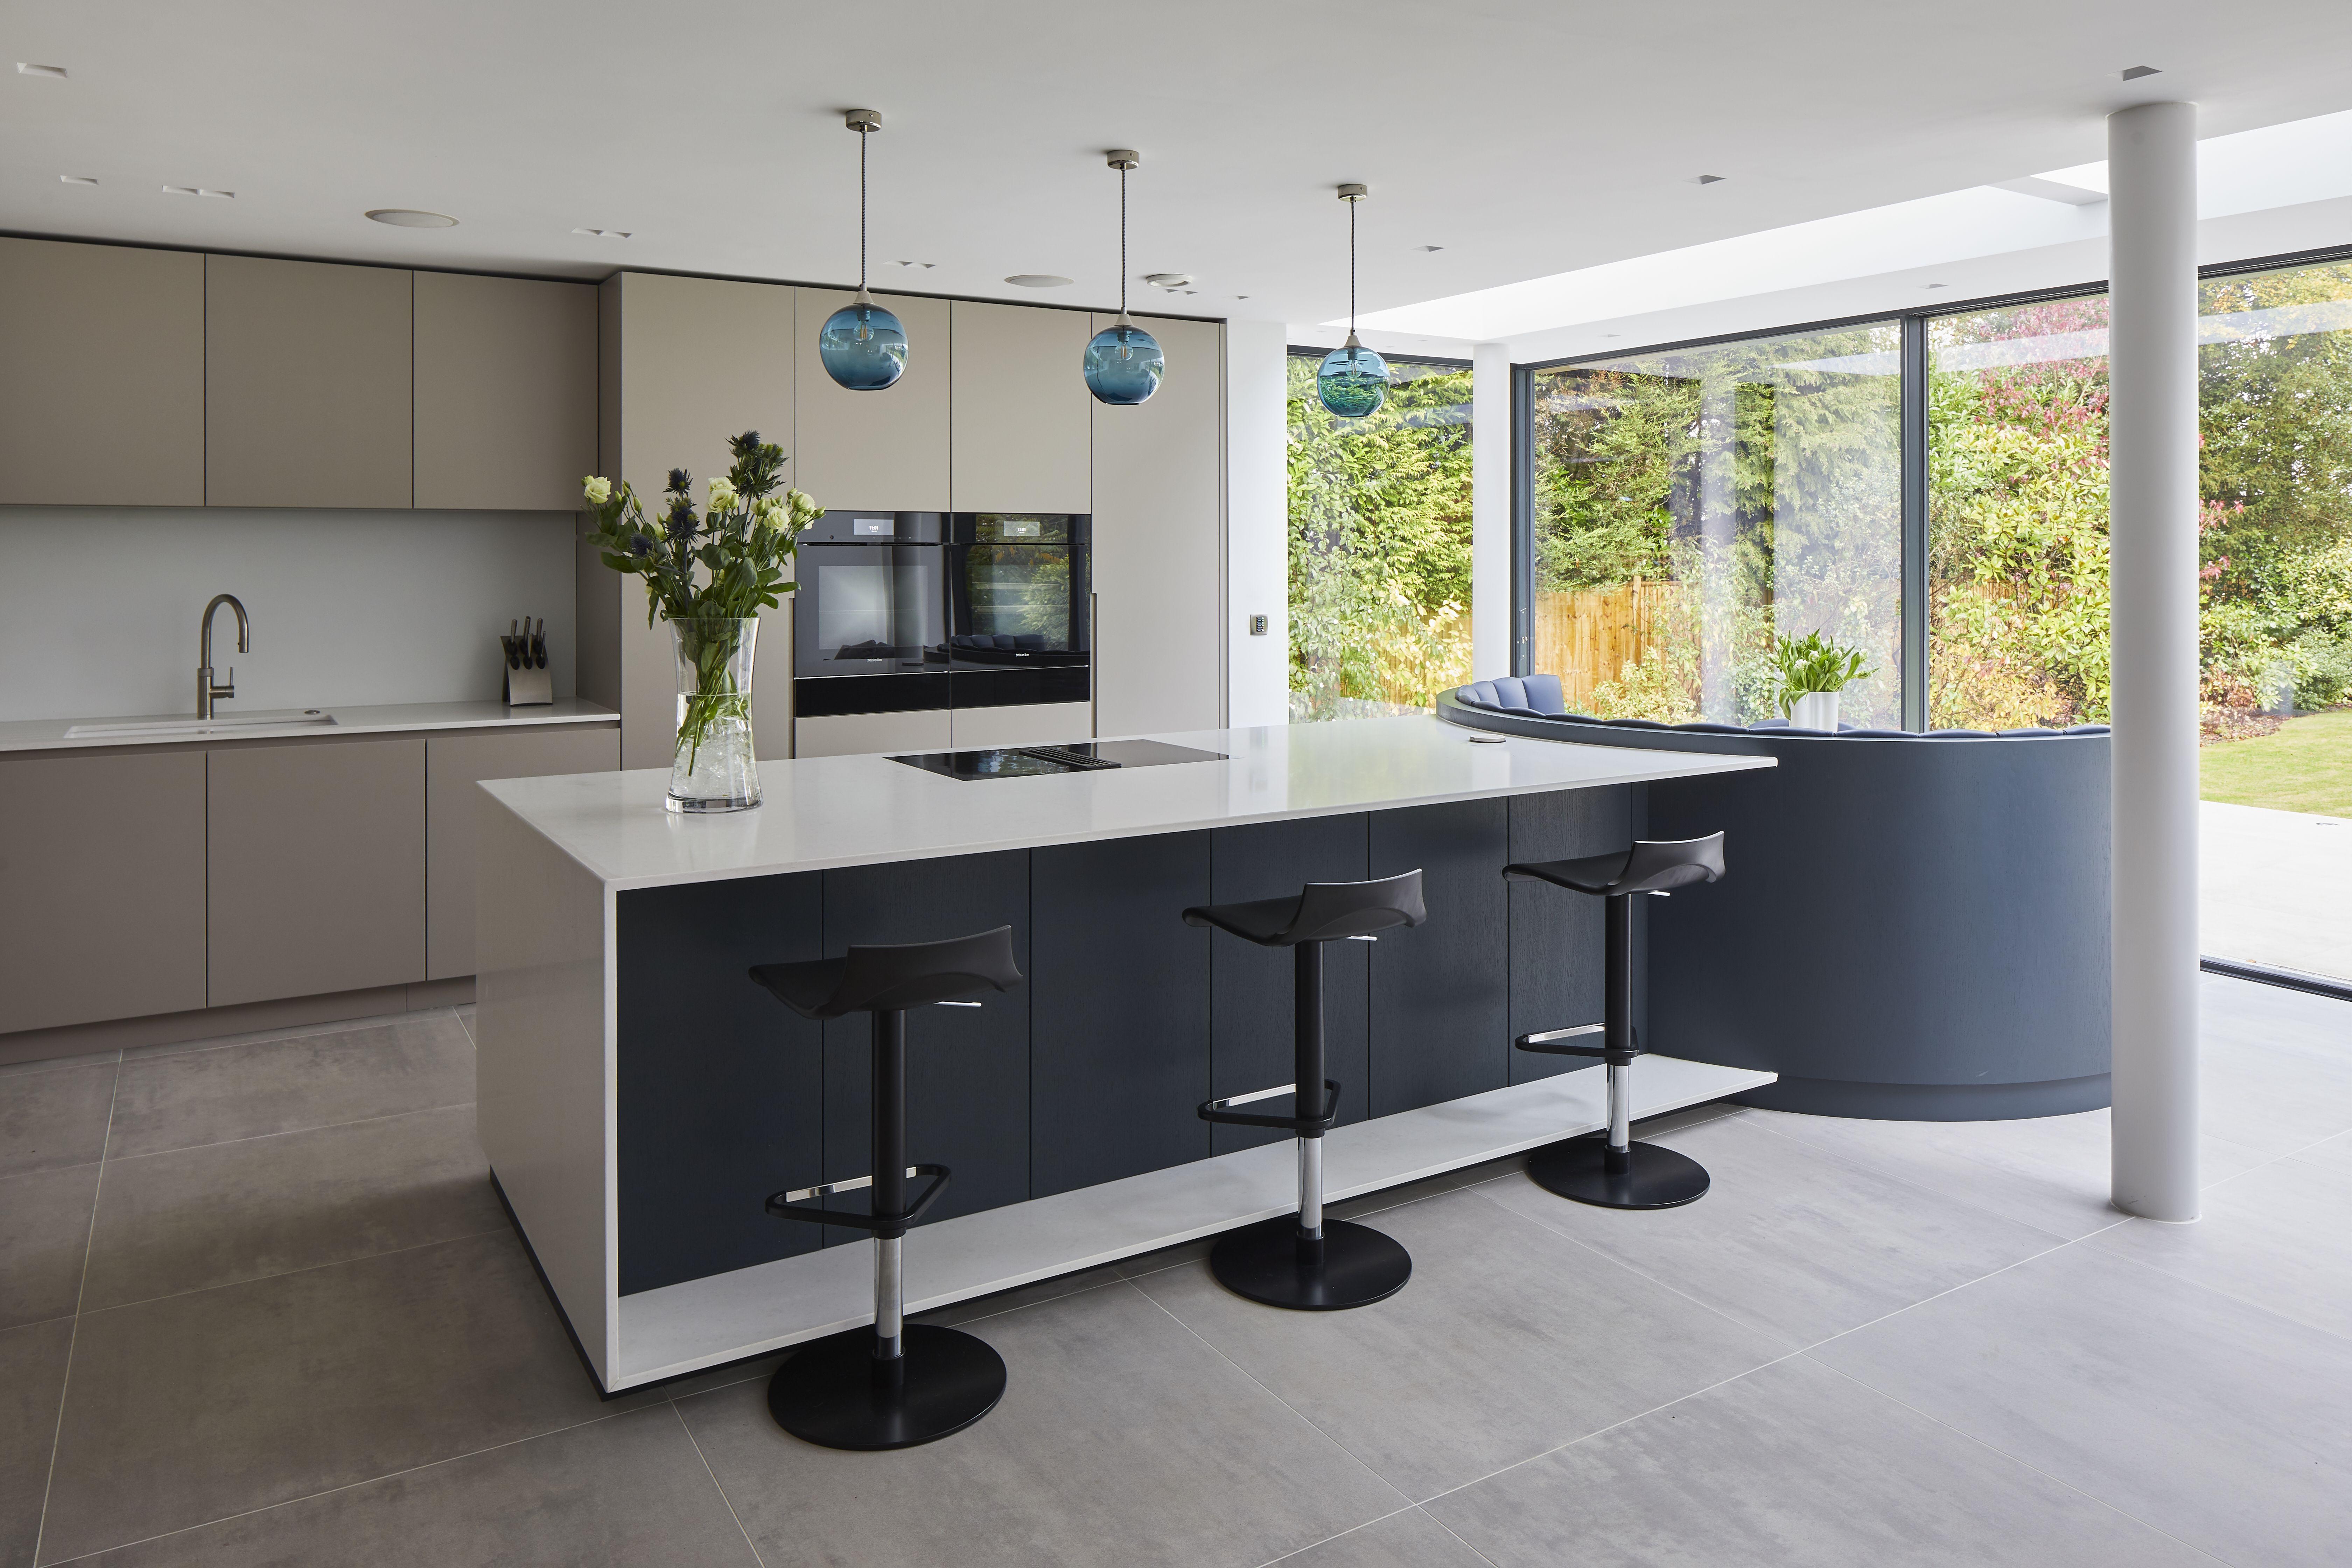 Stunning contemporary handleless kitchen by piqu piqu.co